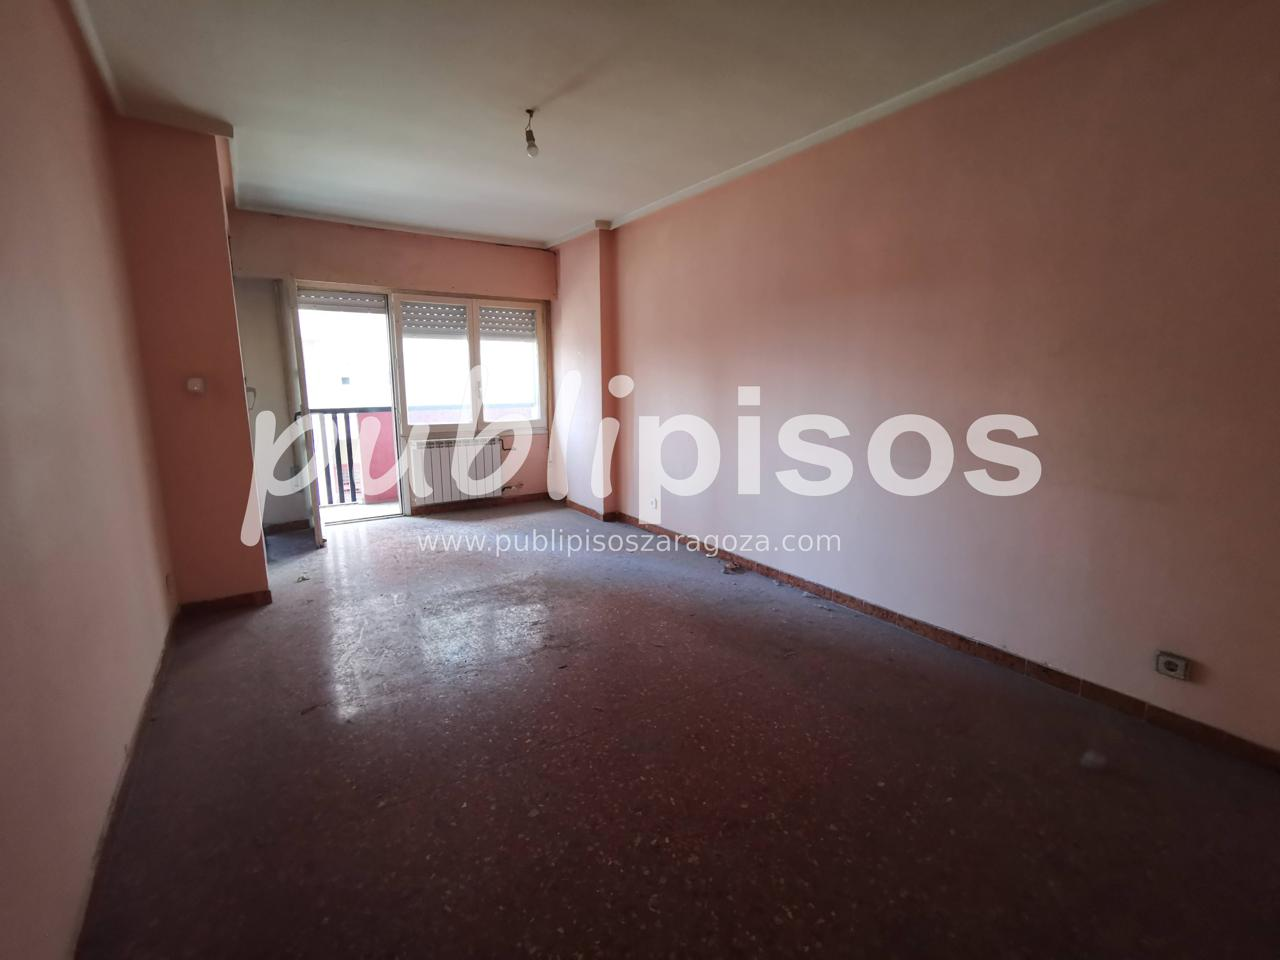 Venta de piso junto avenida Navarra Zaragoza-24